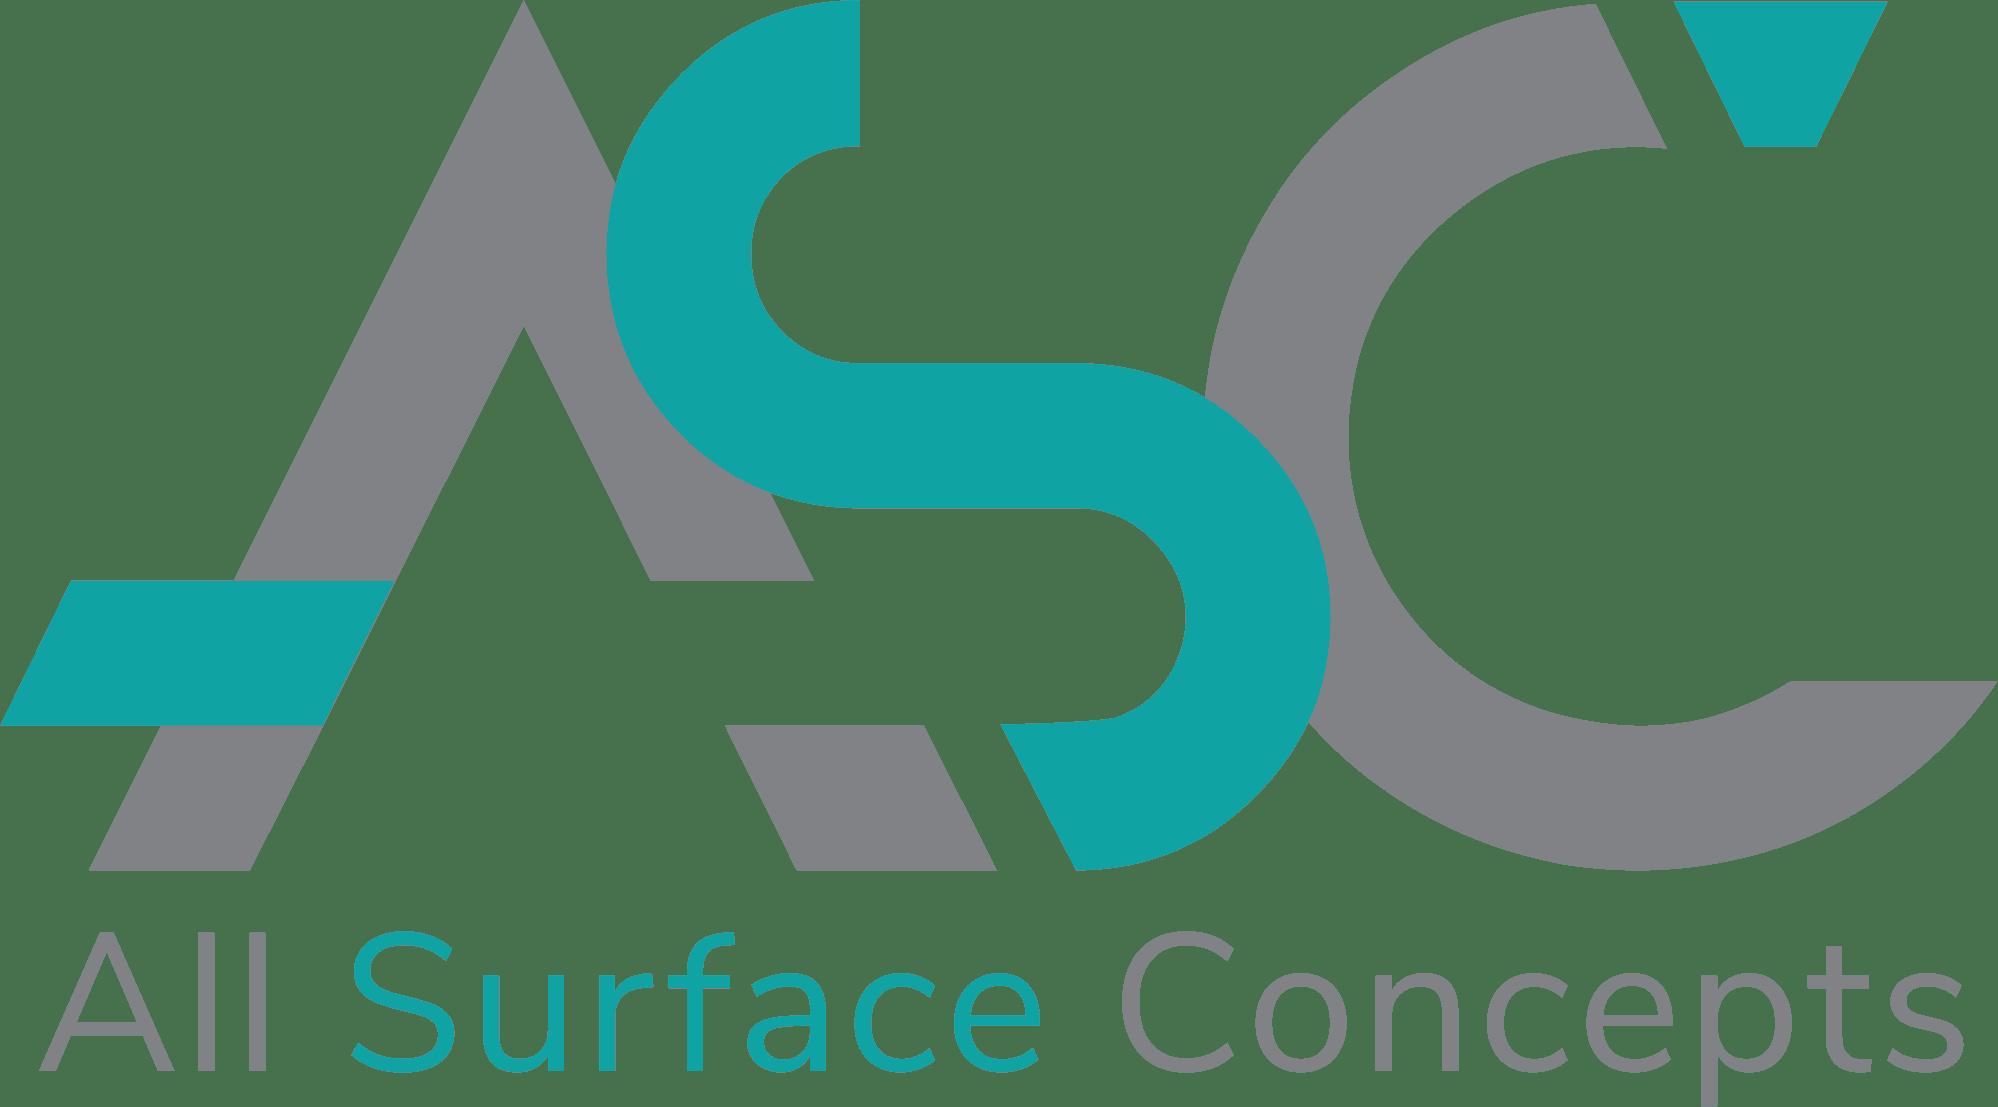 All Surface Concept Logo